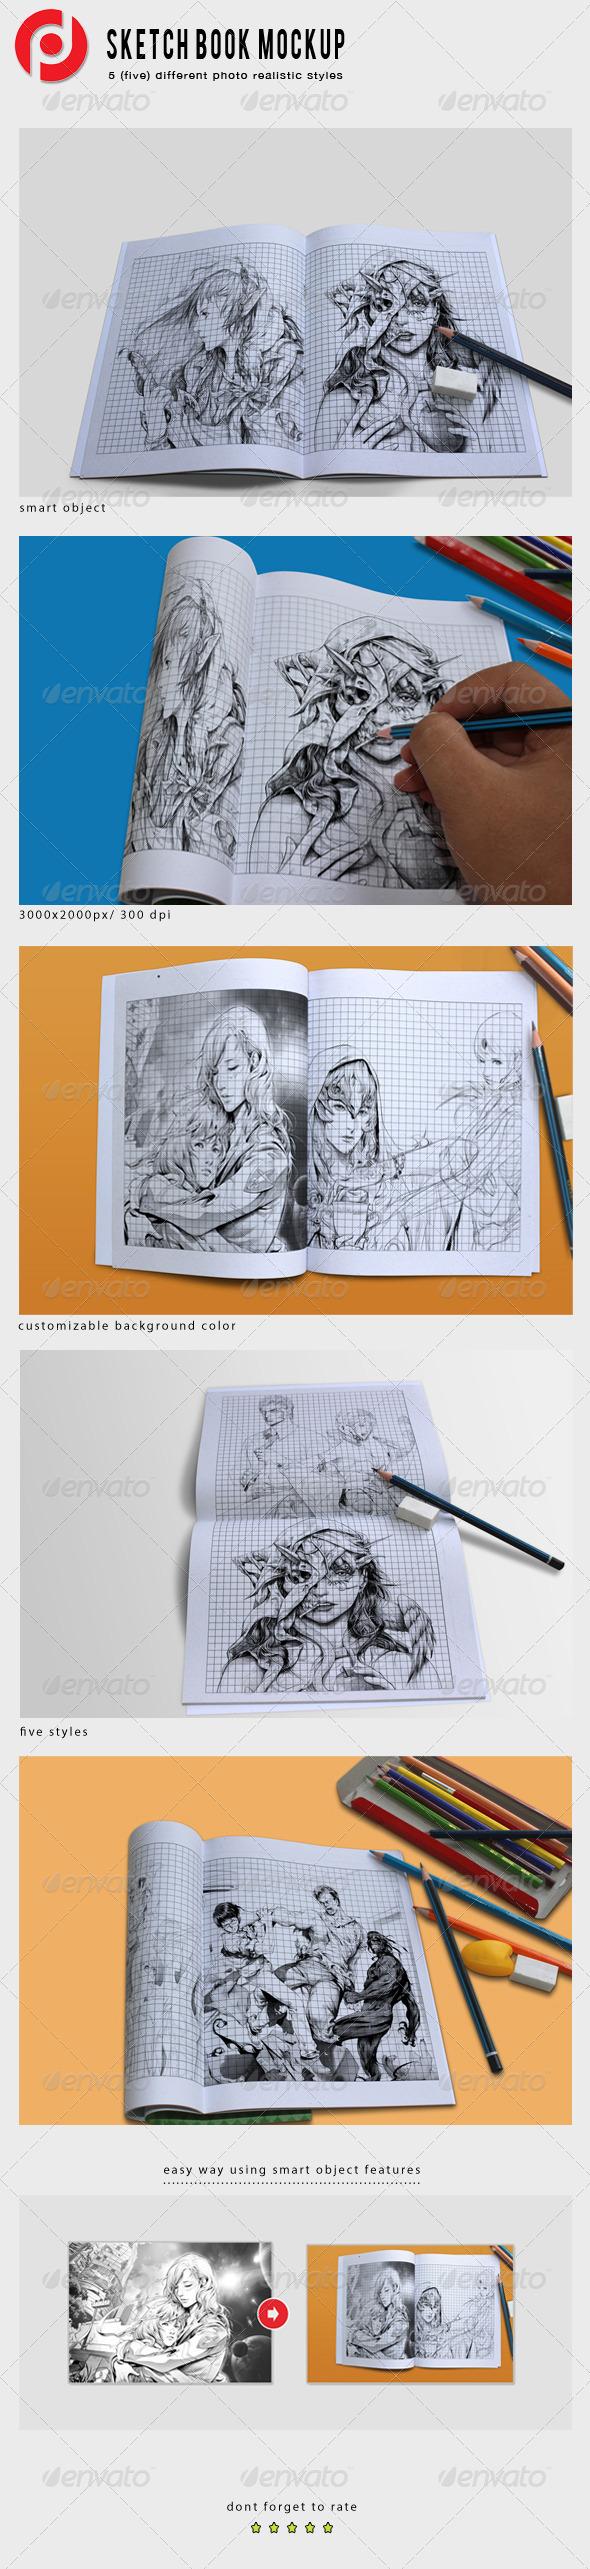 Sketch Book Mockups - Product Mock-Ups Graphics